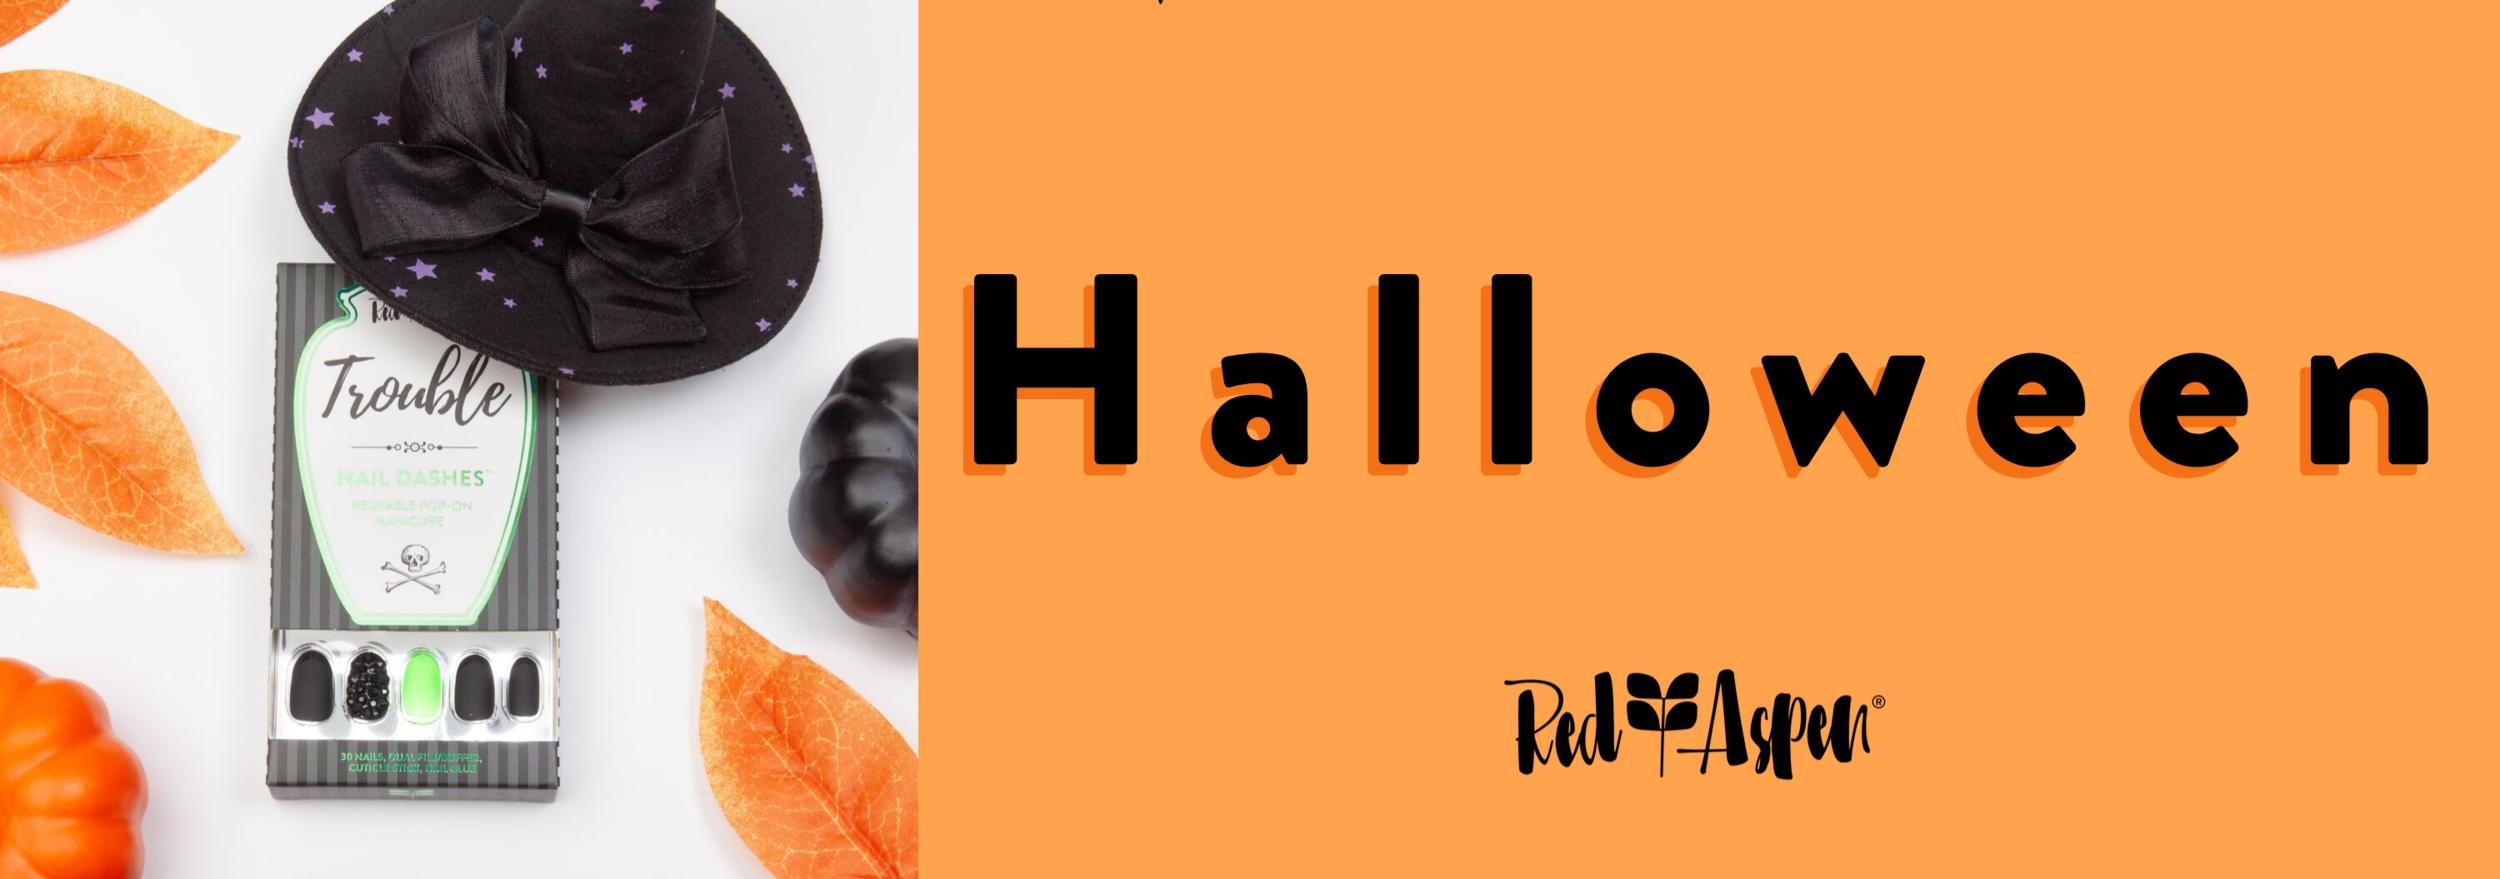 Halloween Banner.png